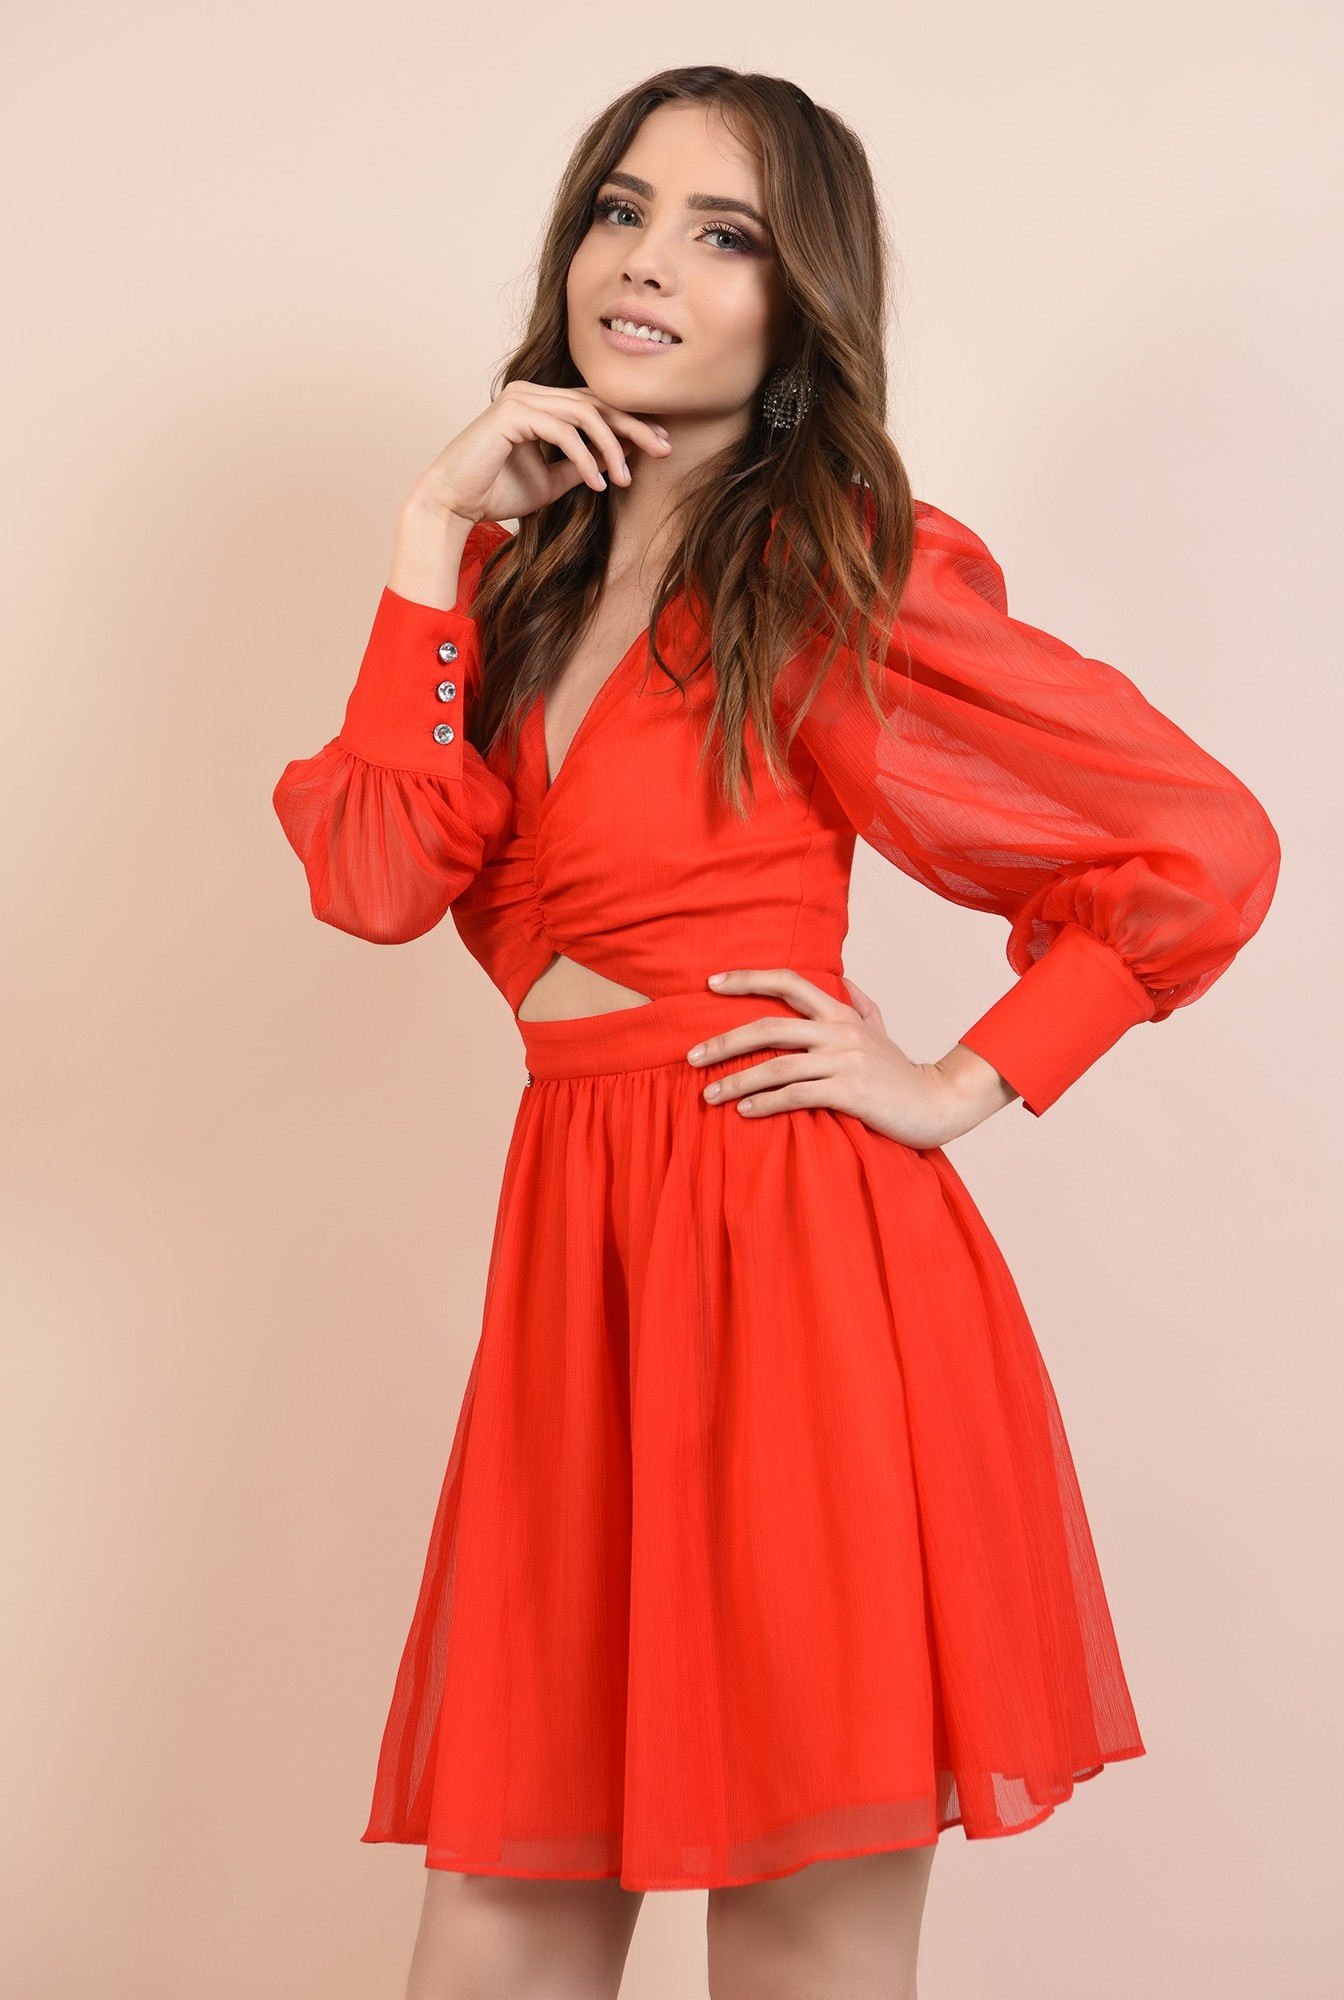 2 - rochie de ocazie, din voal creponat, rosu, cu bust fronsat, croi evazat